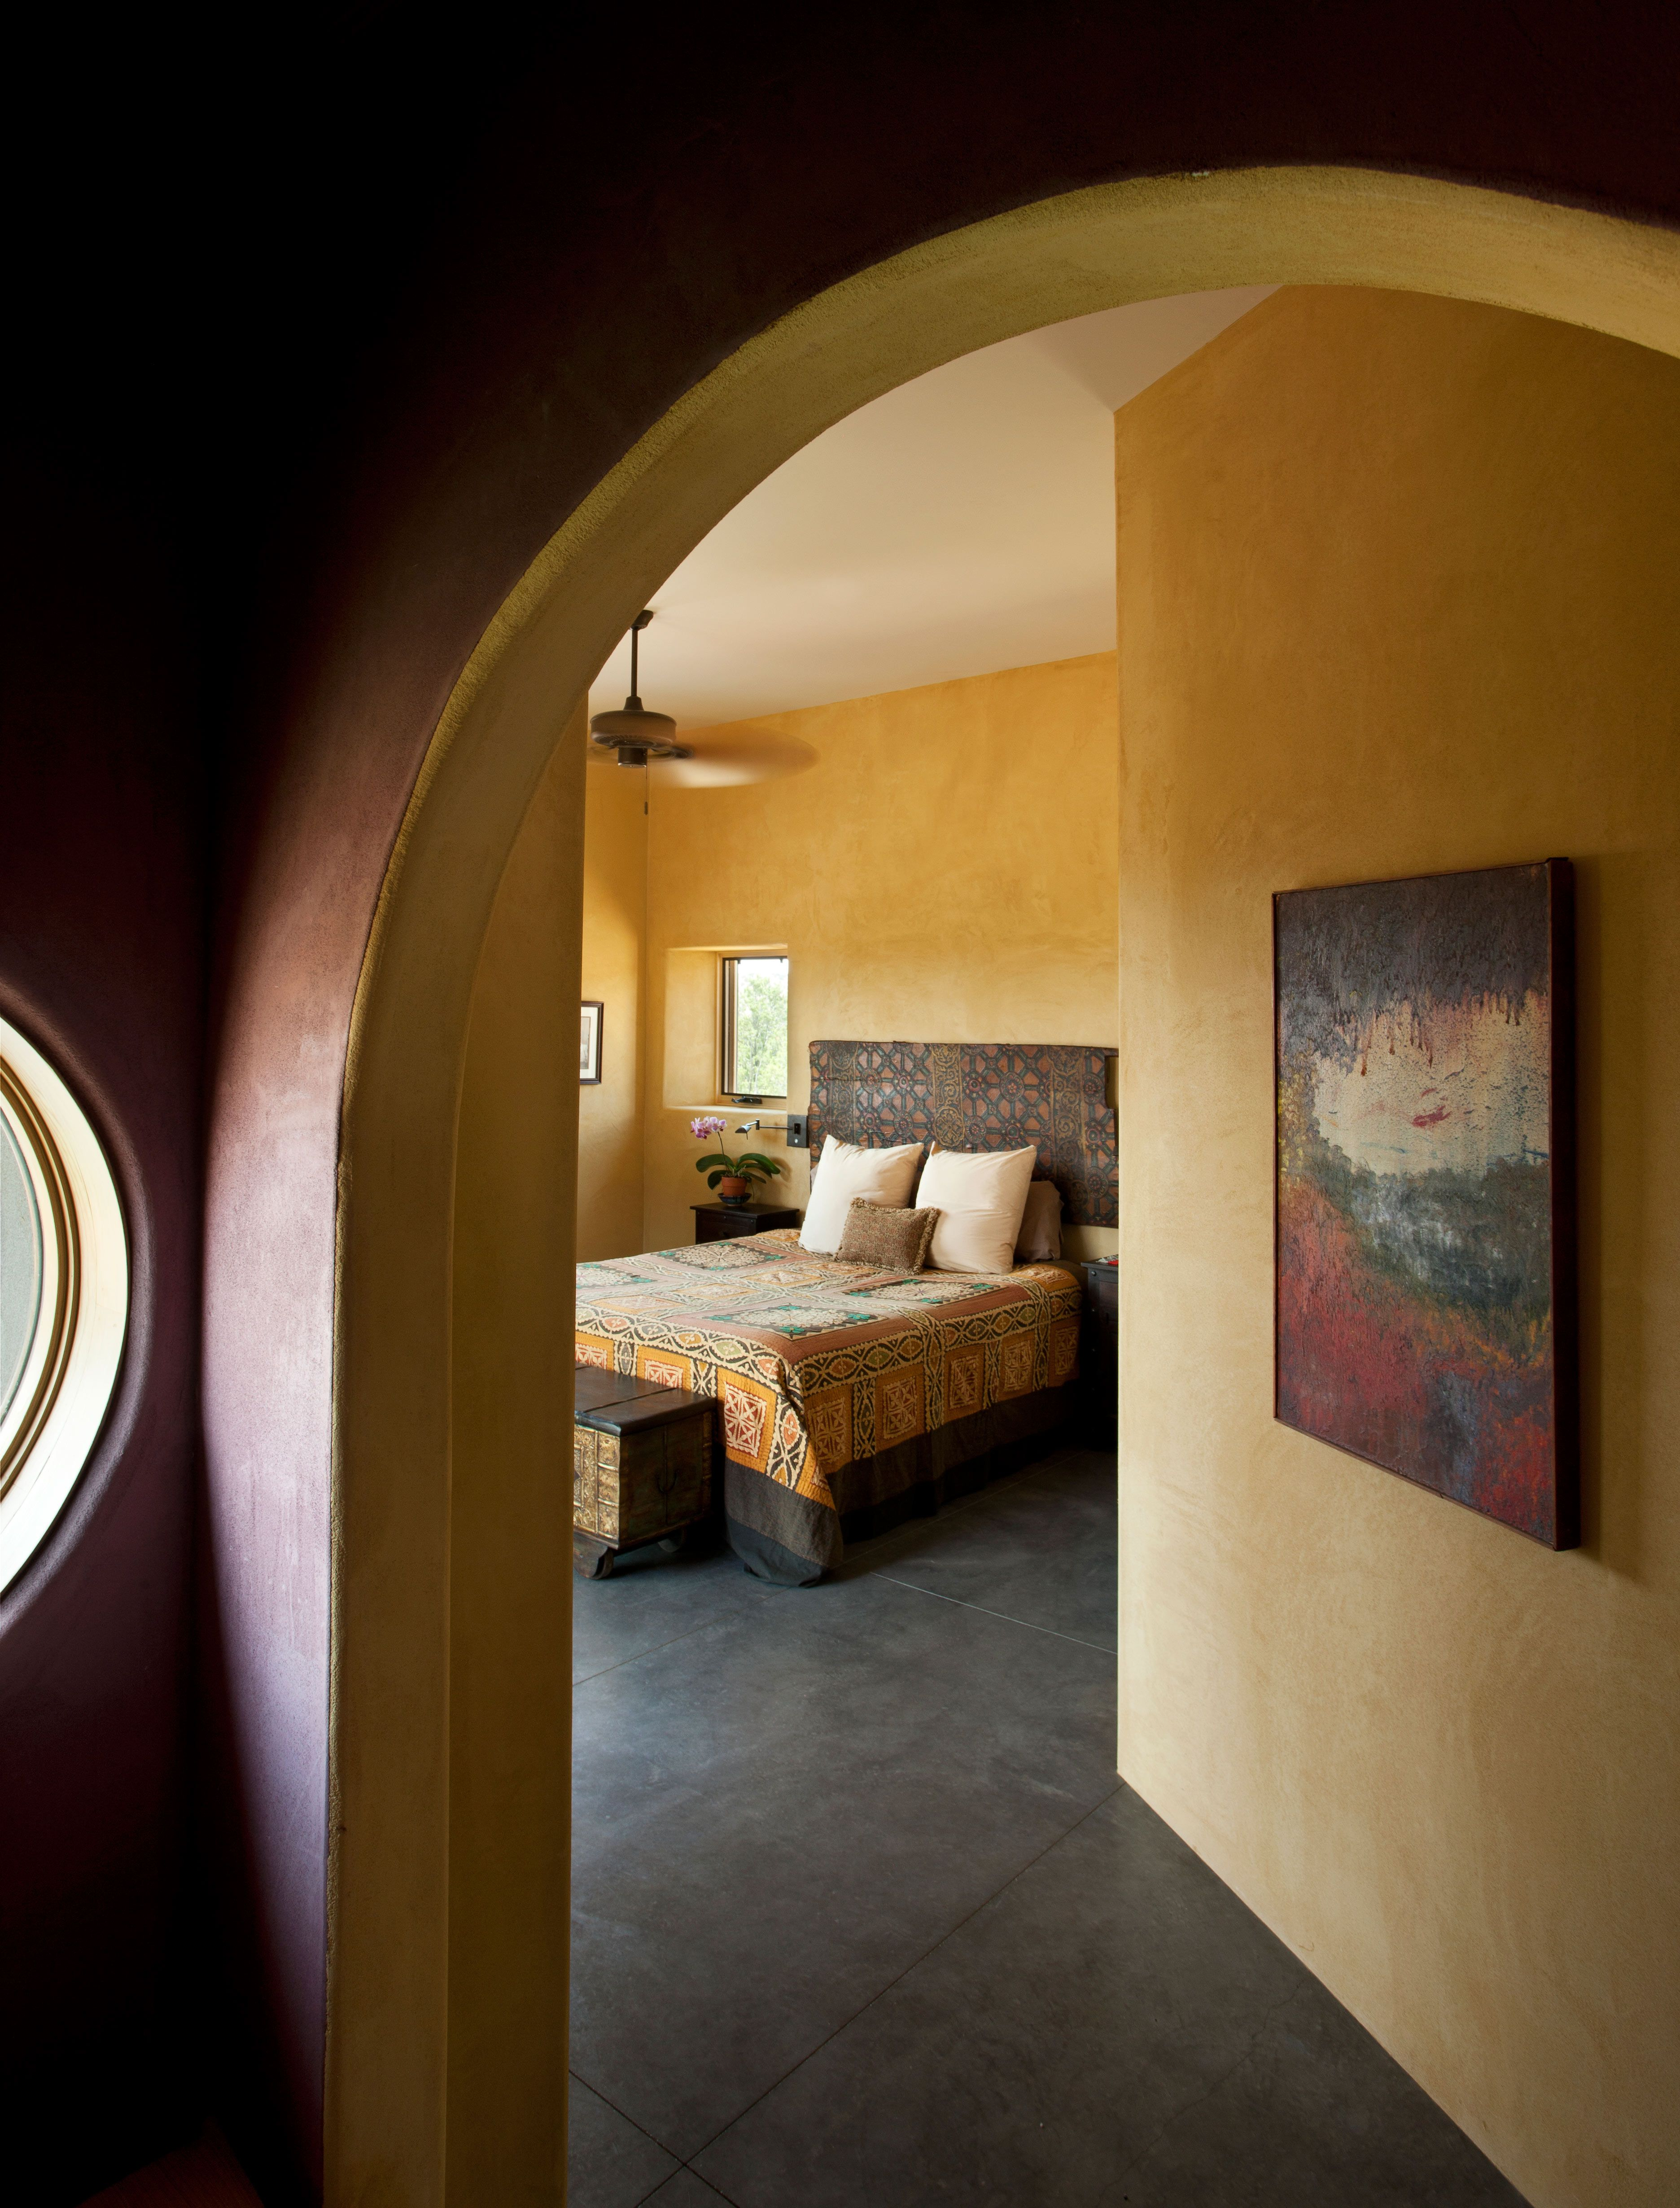 Architect Fort Collins   Architecture design, House design ...